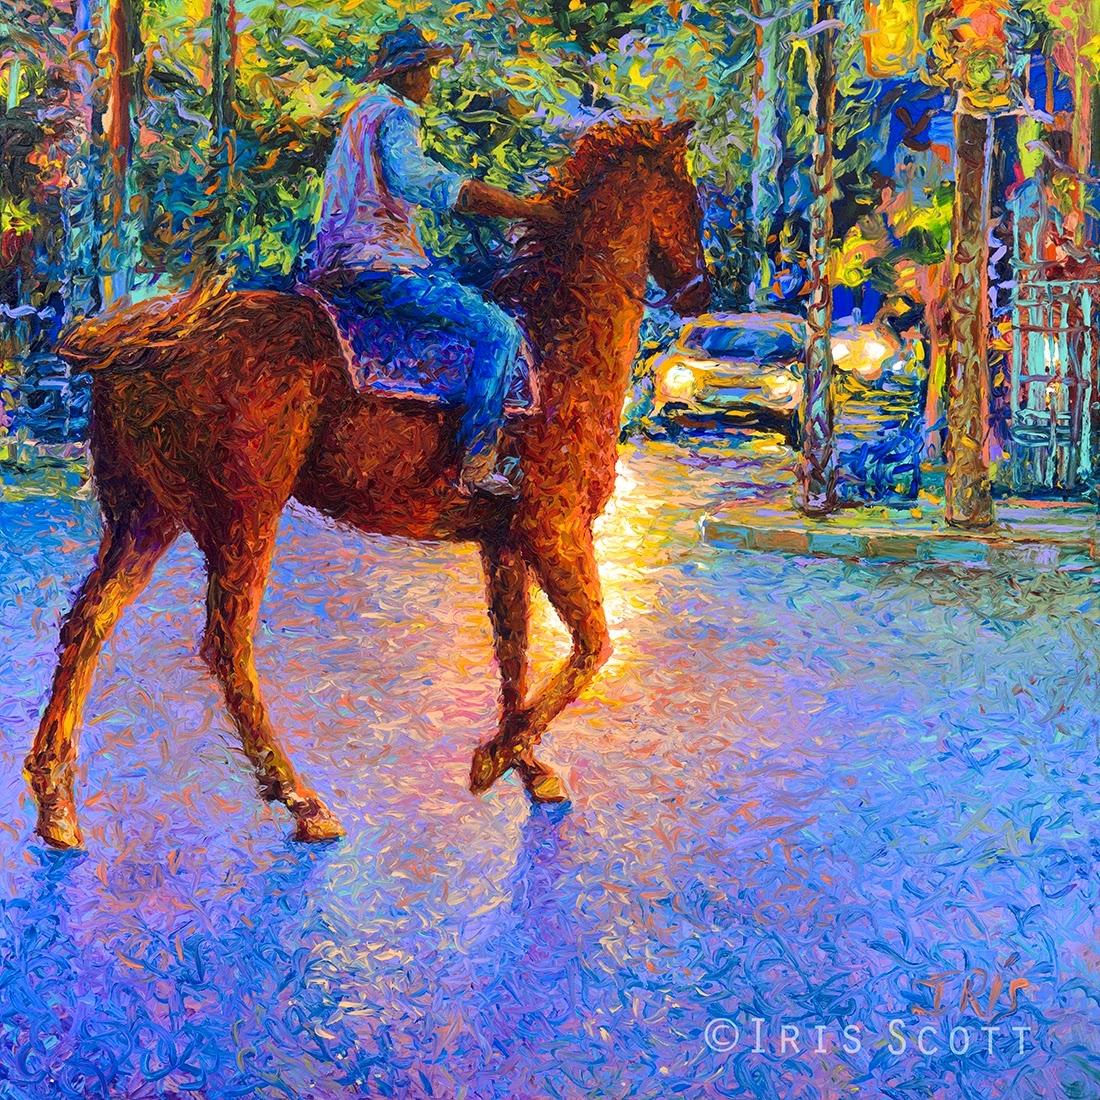 05-My-Thai-Cowboy-Iris-Scott-Finger-Painting-Fine-Art-www-designstack-co